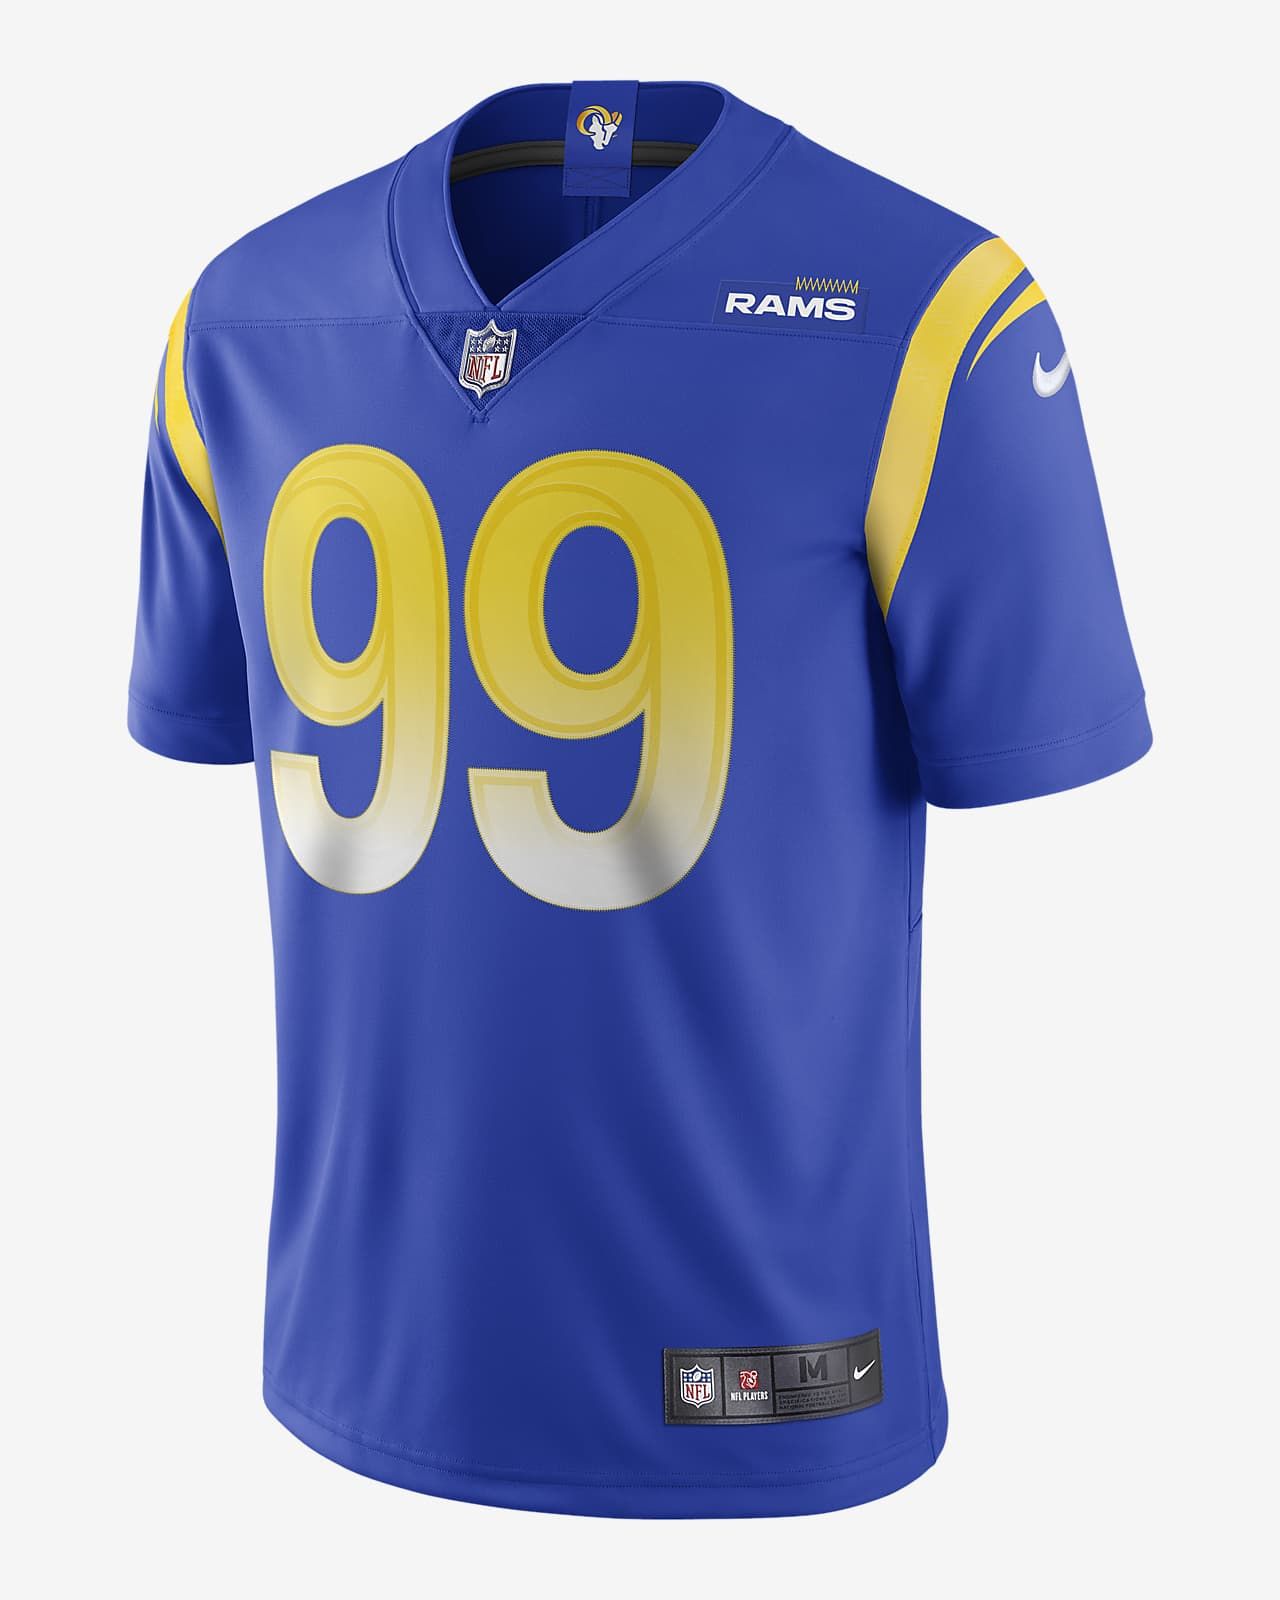 NFL Los Angeles Rams Vapor Untouchable (Aaron Donald) Men's Limited Football Jersey